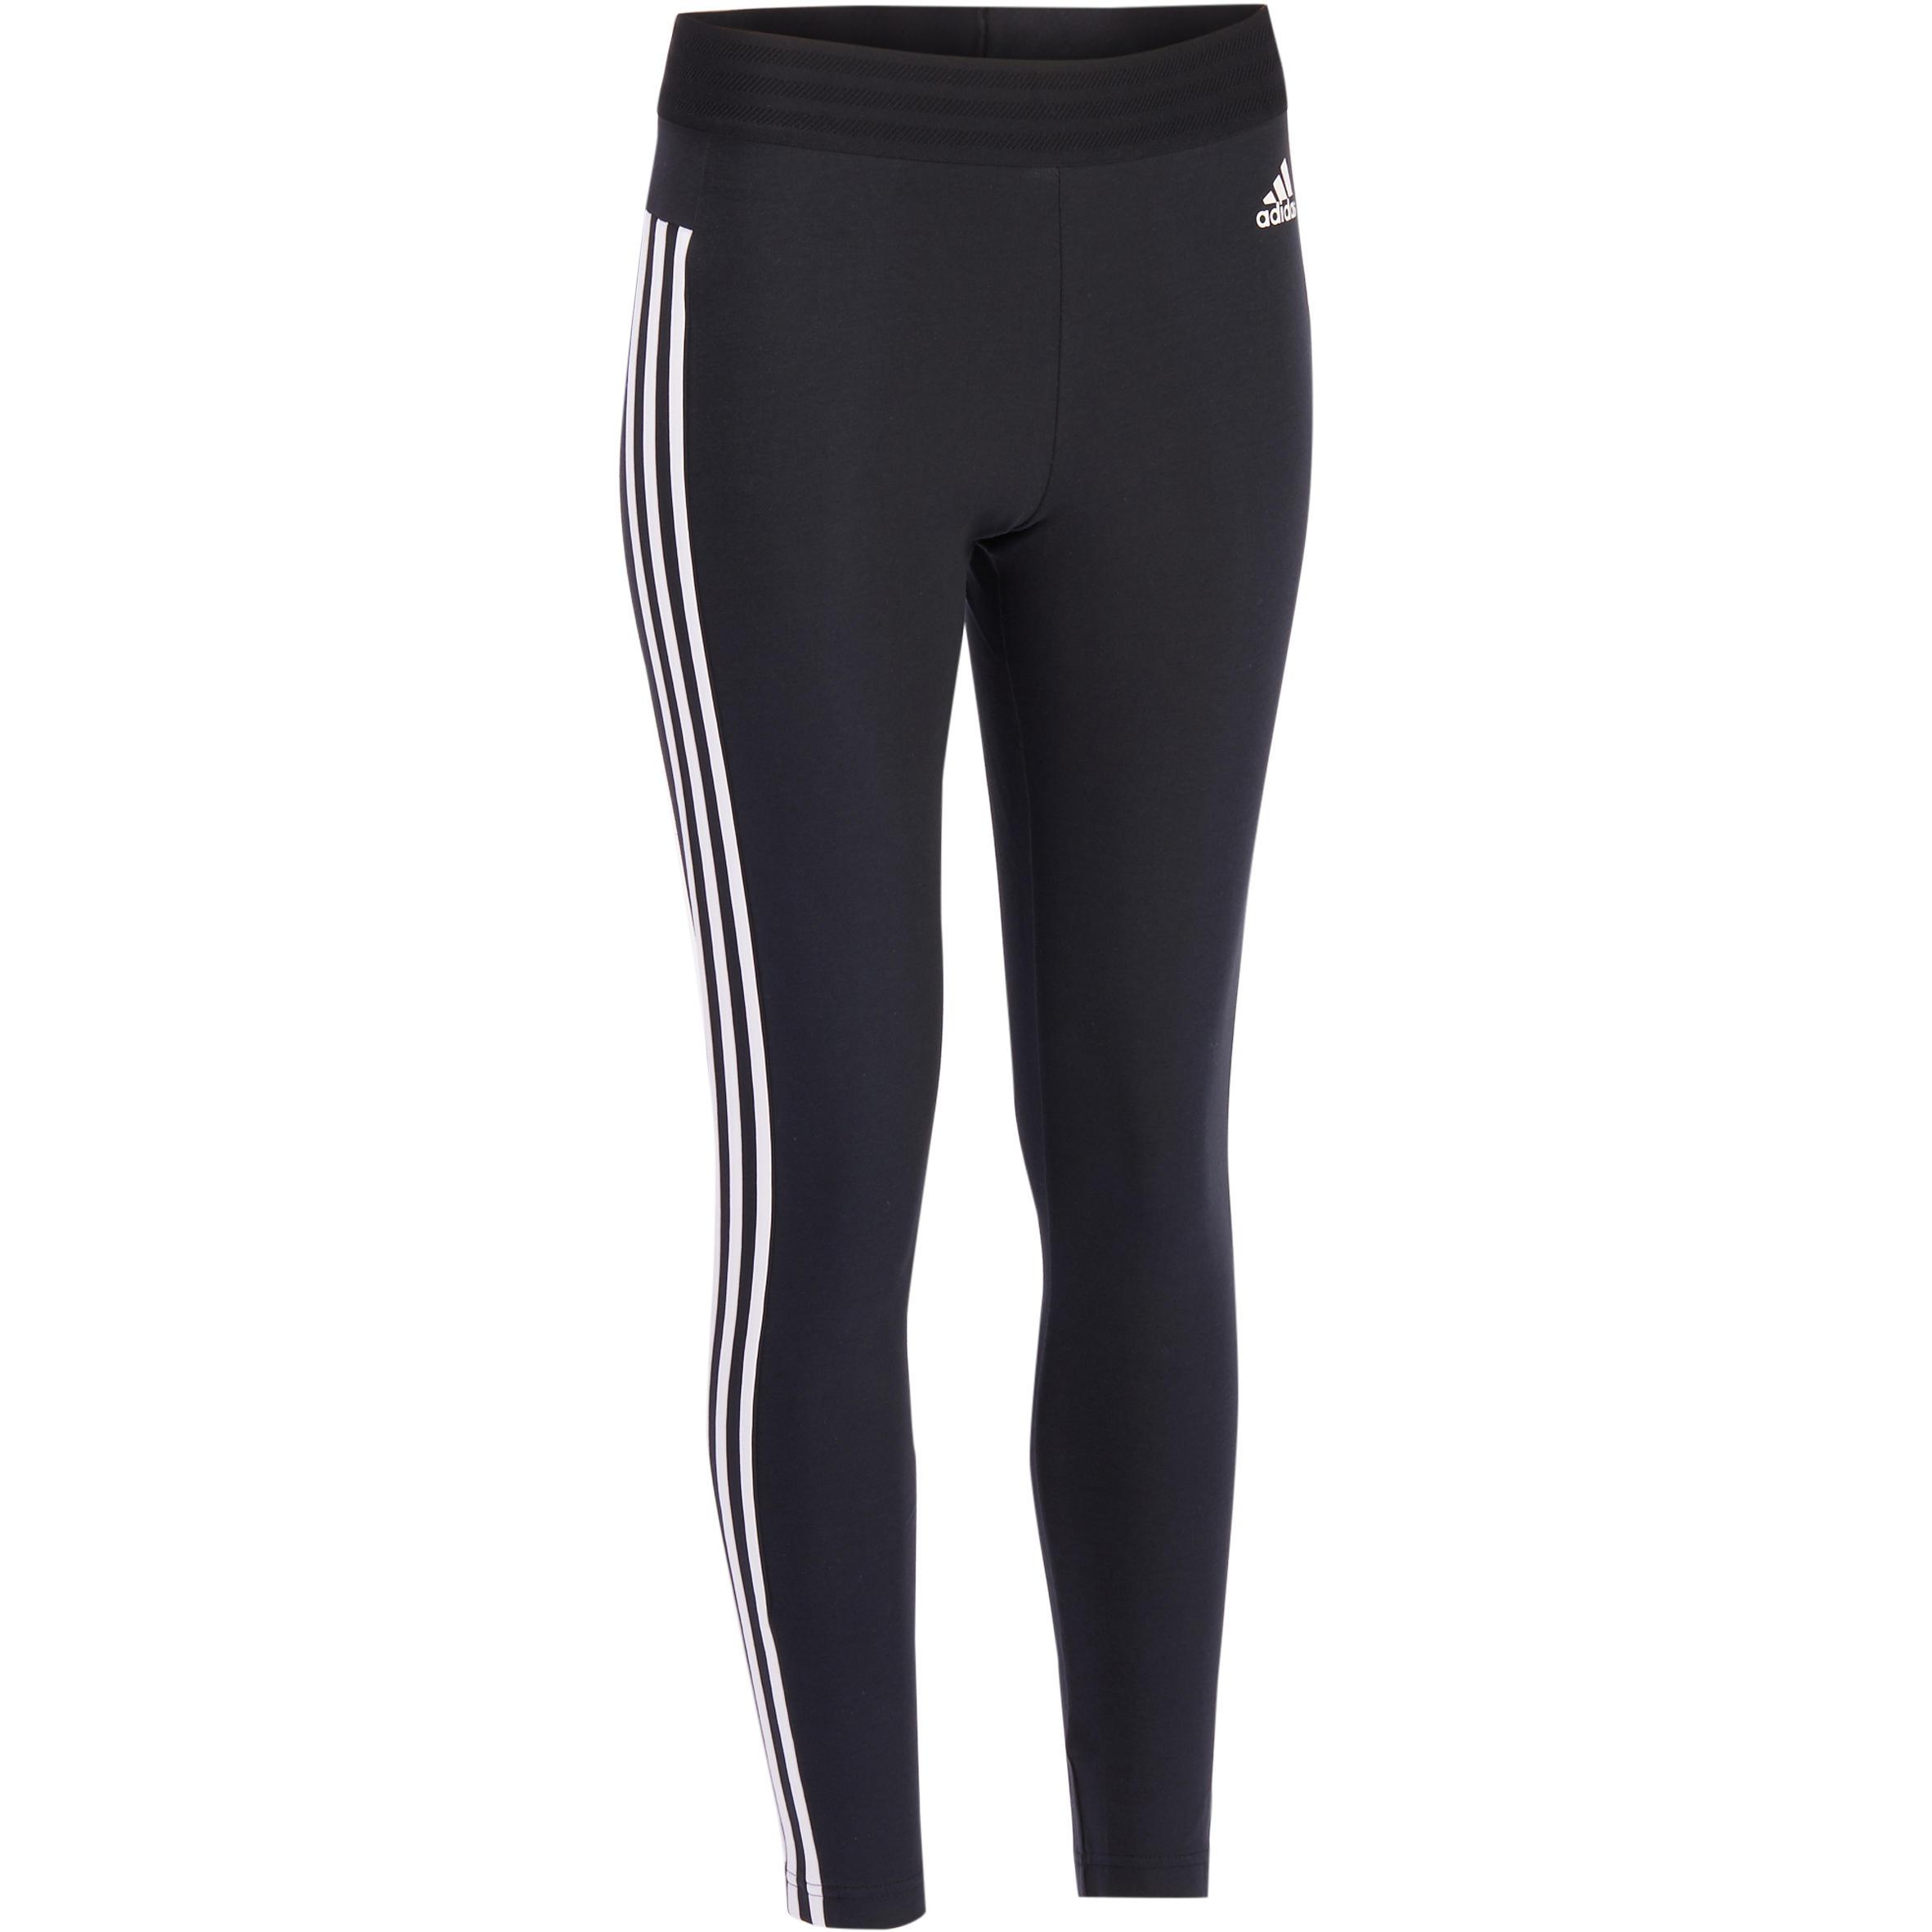 Adidas Dameslegging Adidas voor gym en pilates zwart wit